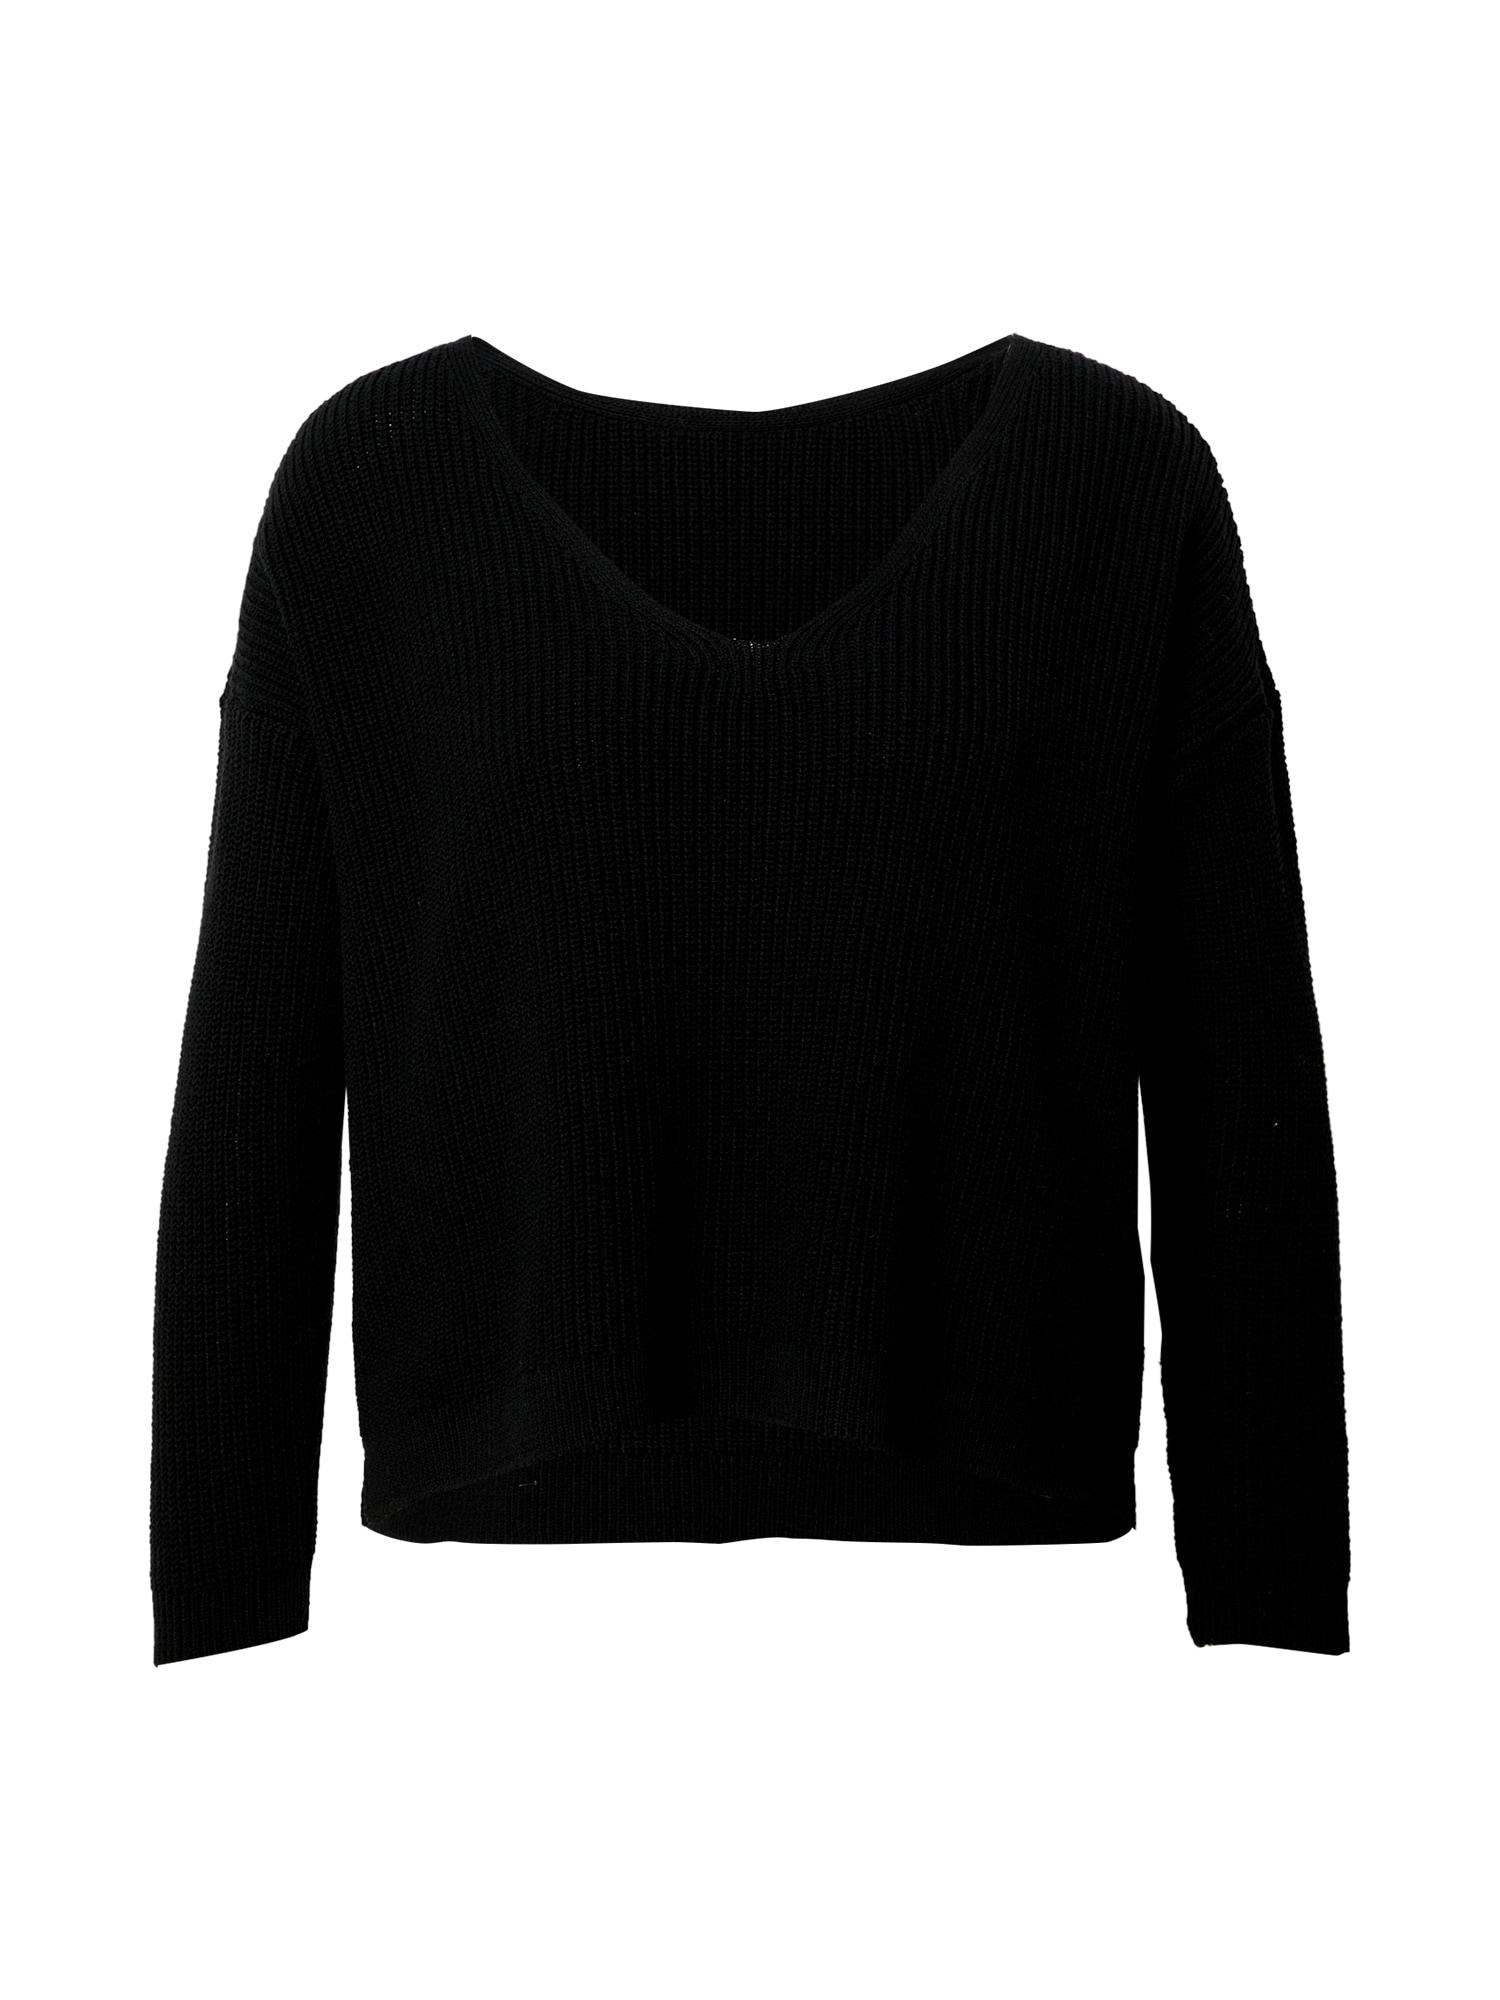 Only (Petite) Megztinis